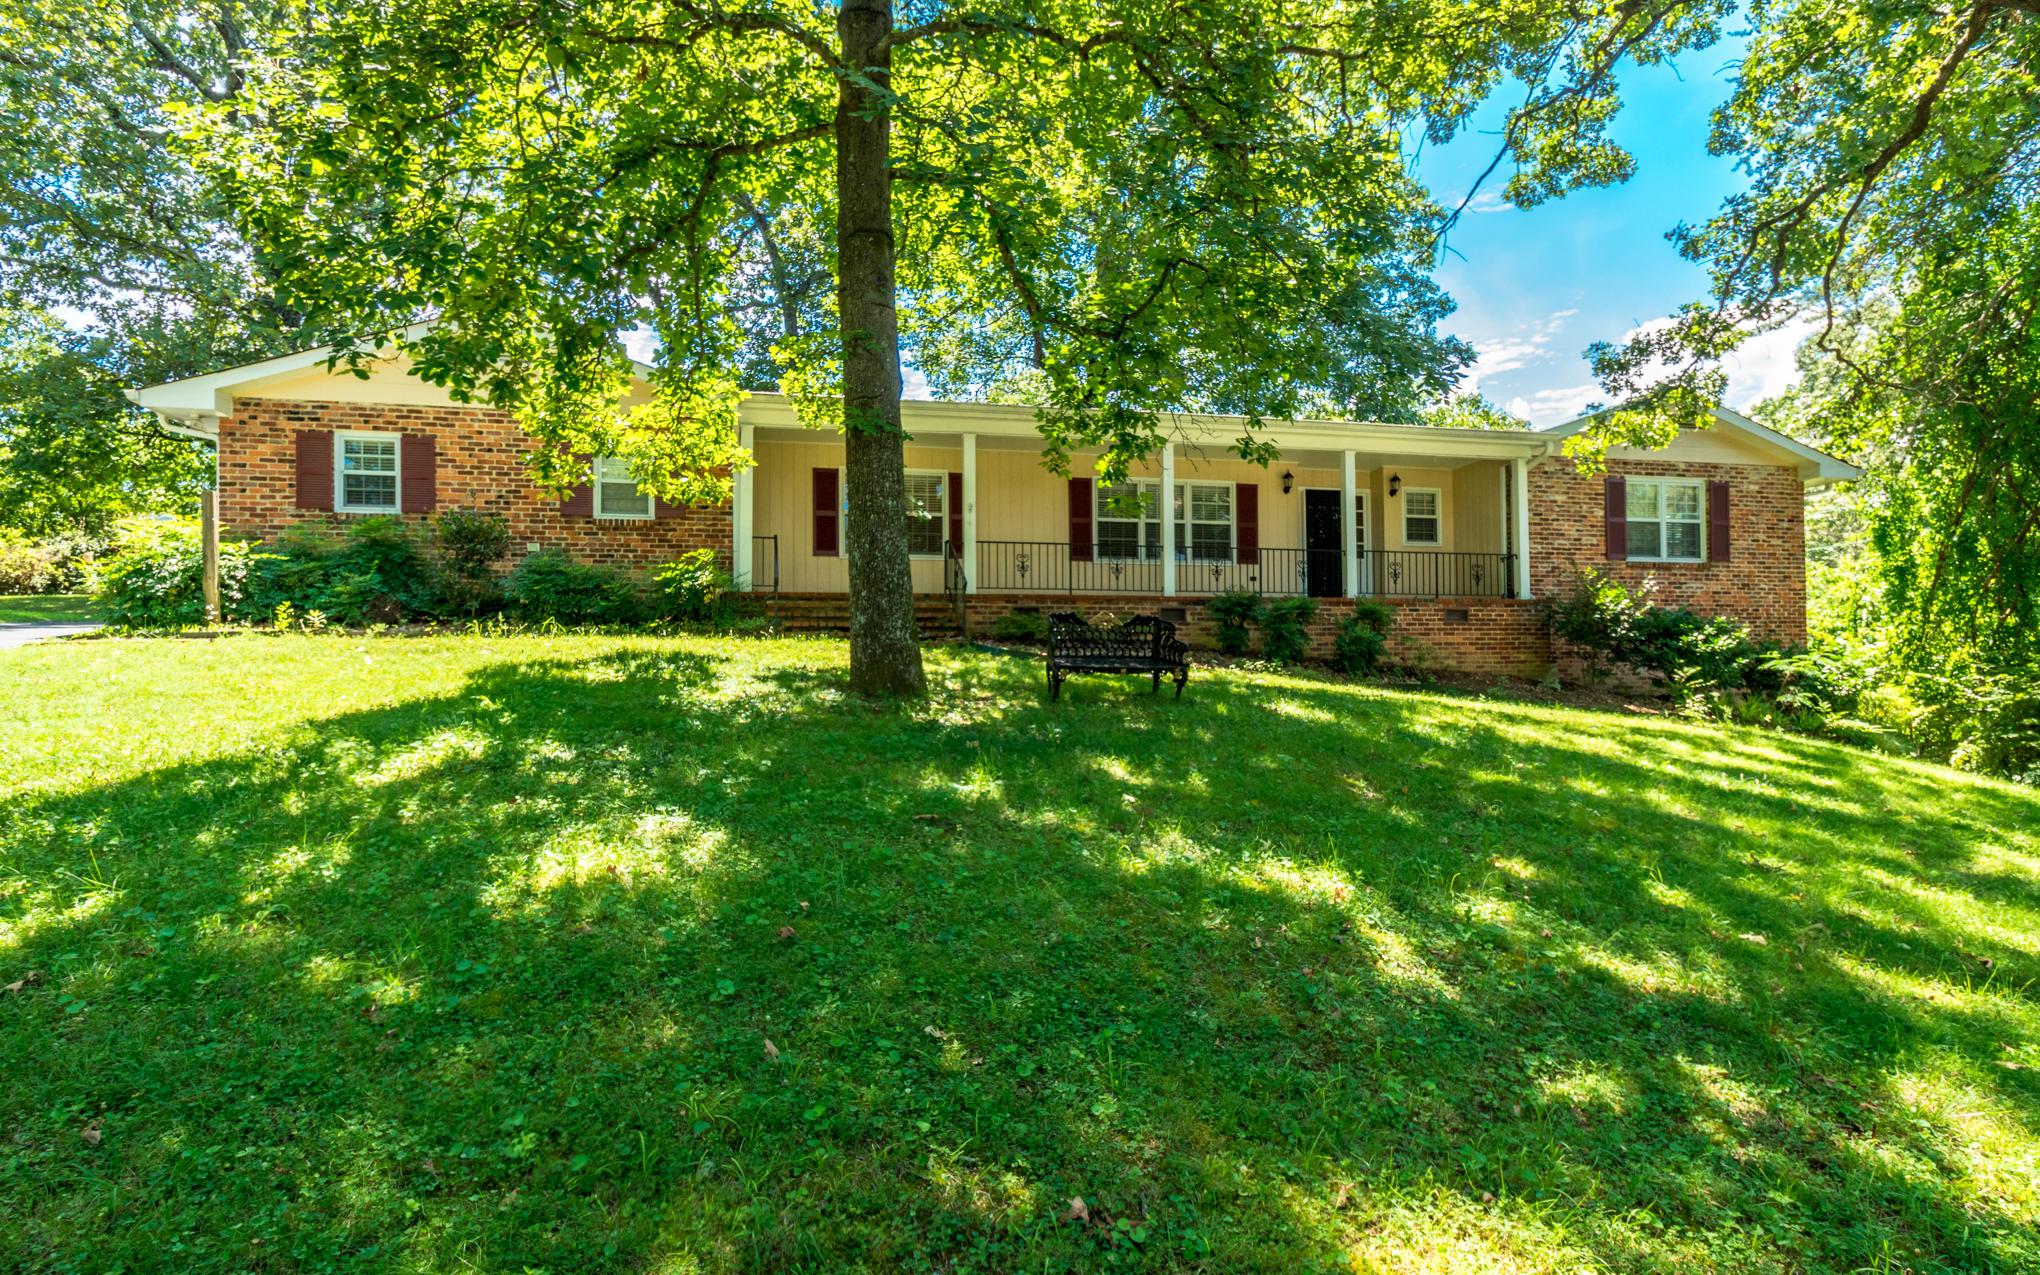 1002 Rivermont Pl, Chattanooga, TN 37415